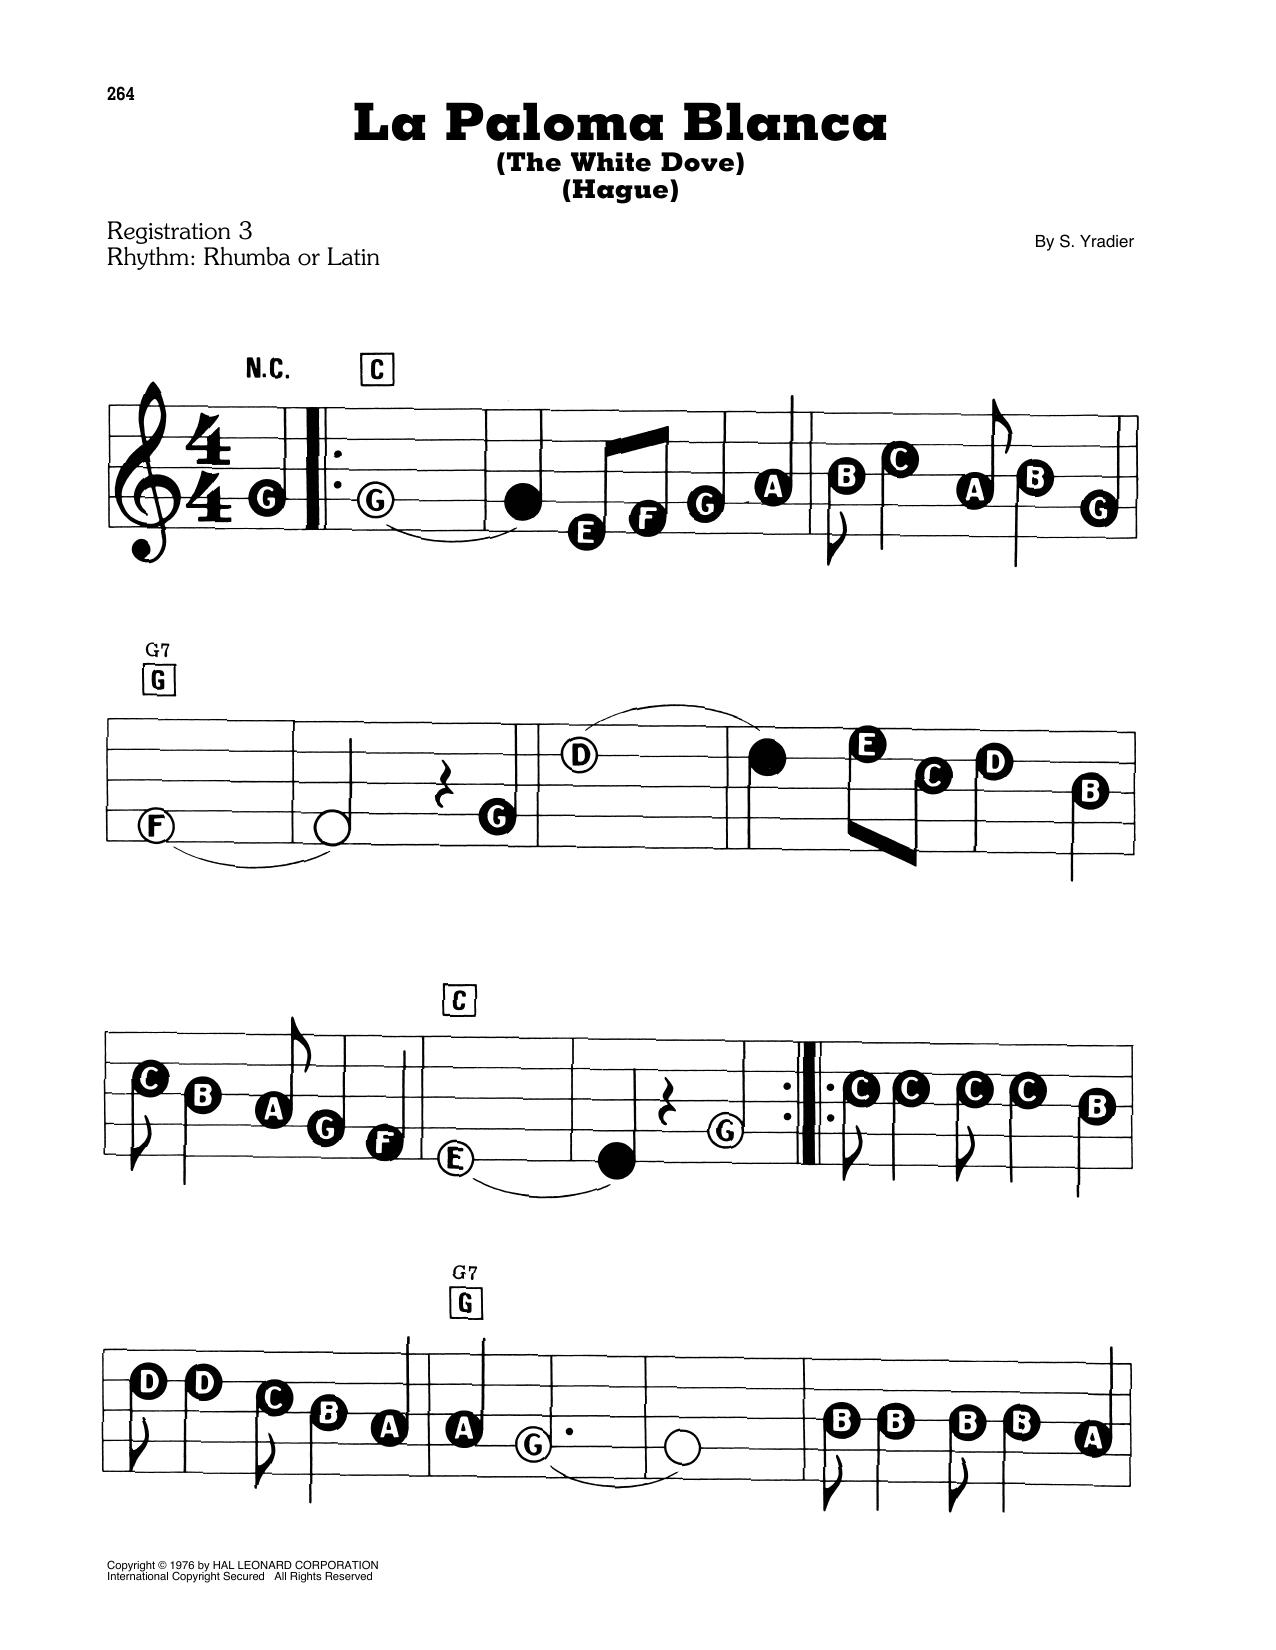 La Paloma Blanca (The White Dove) (E-Z Play Today)